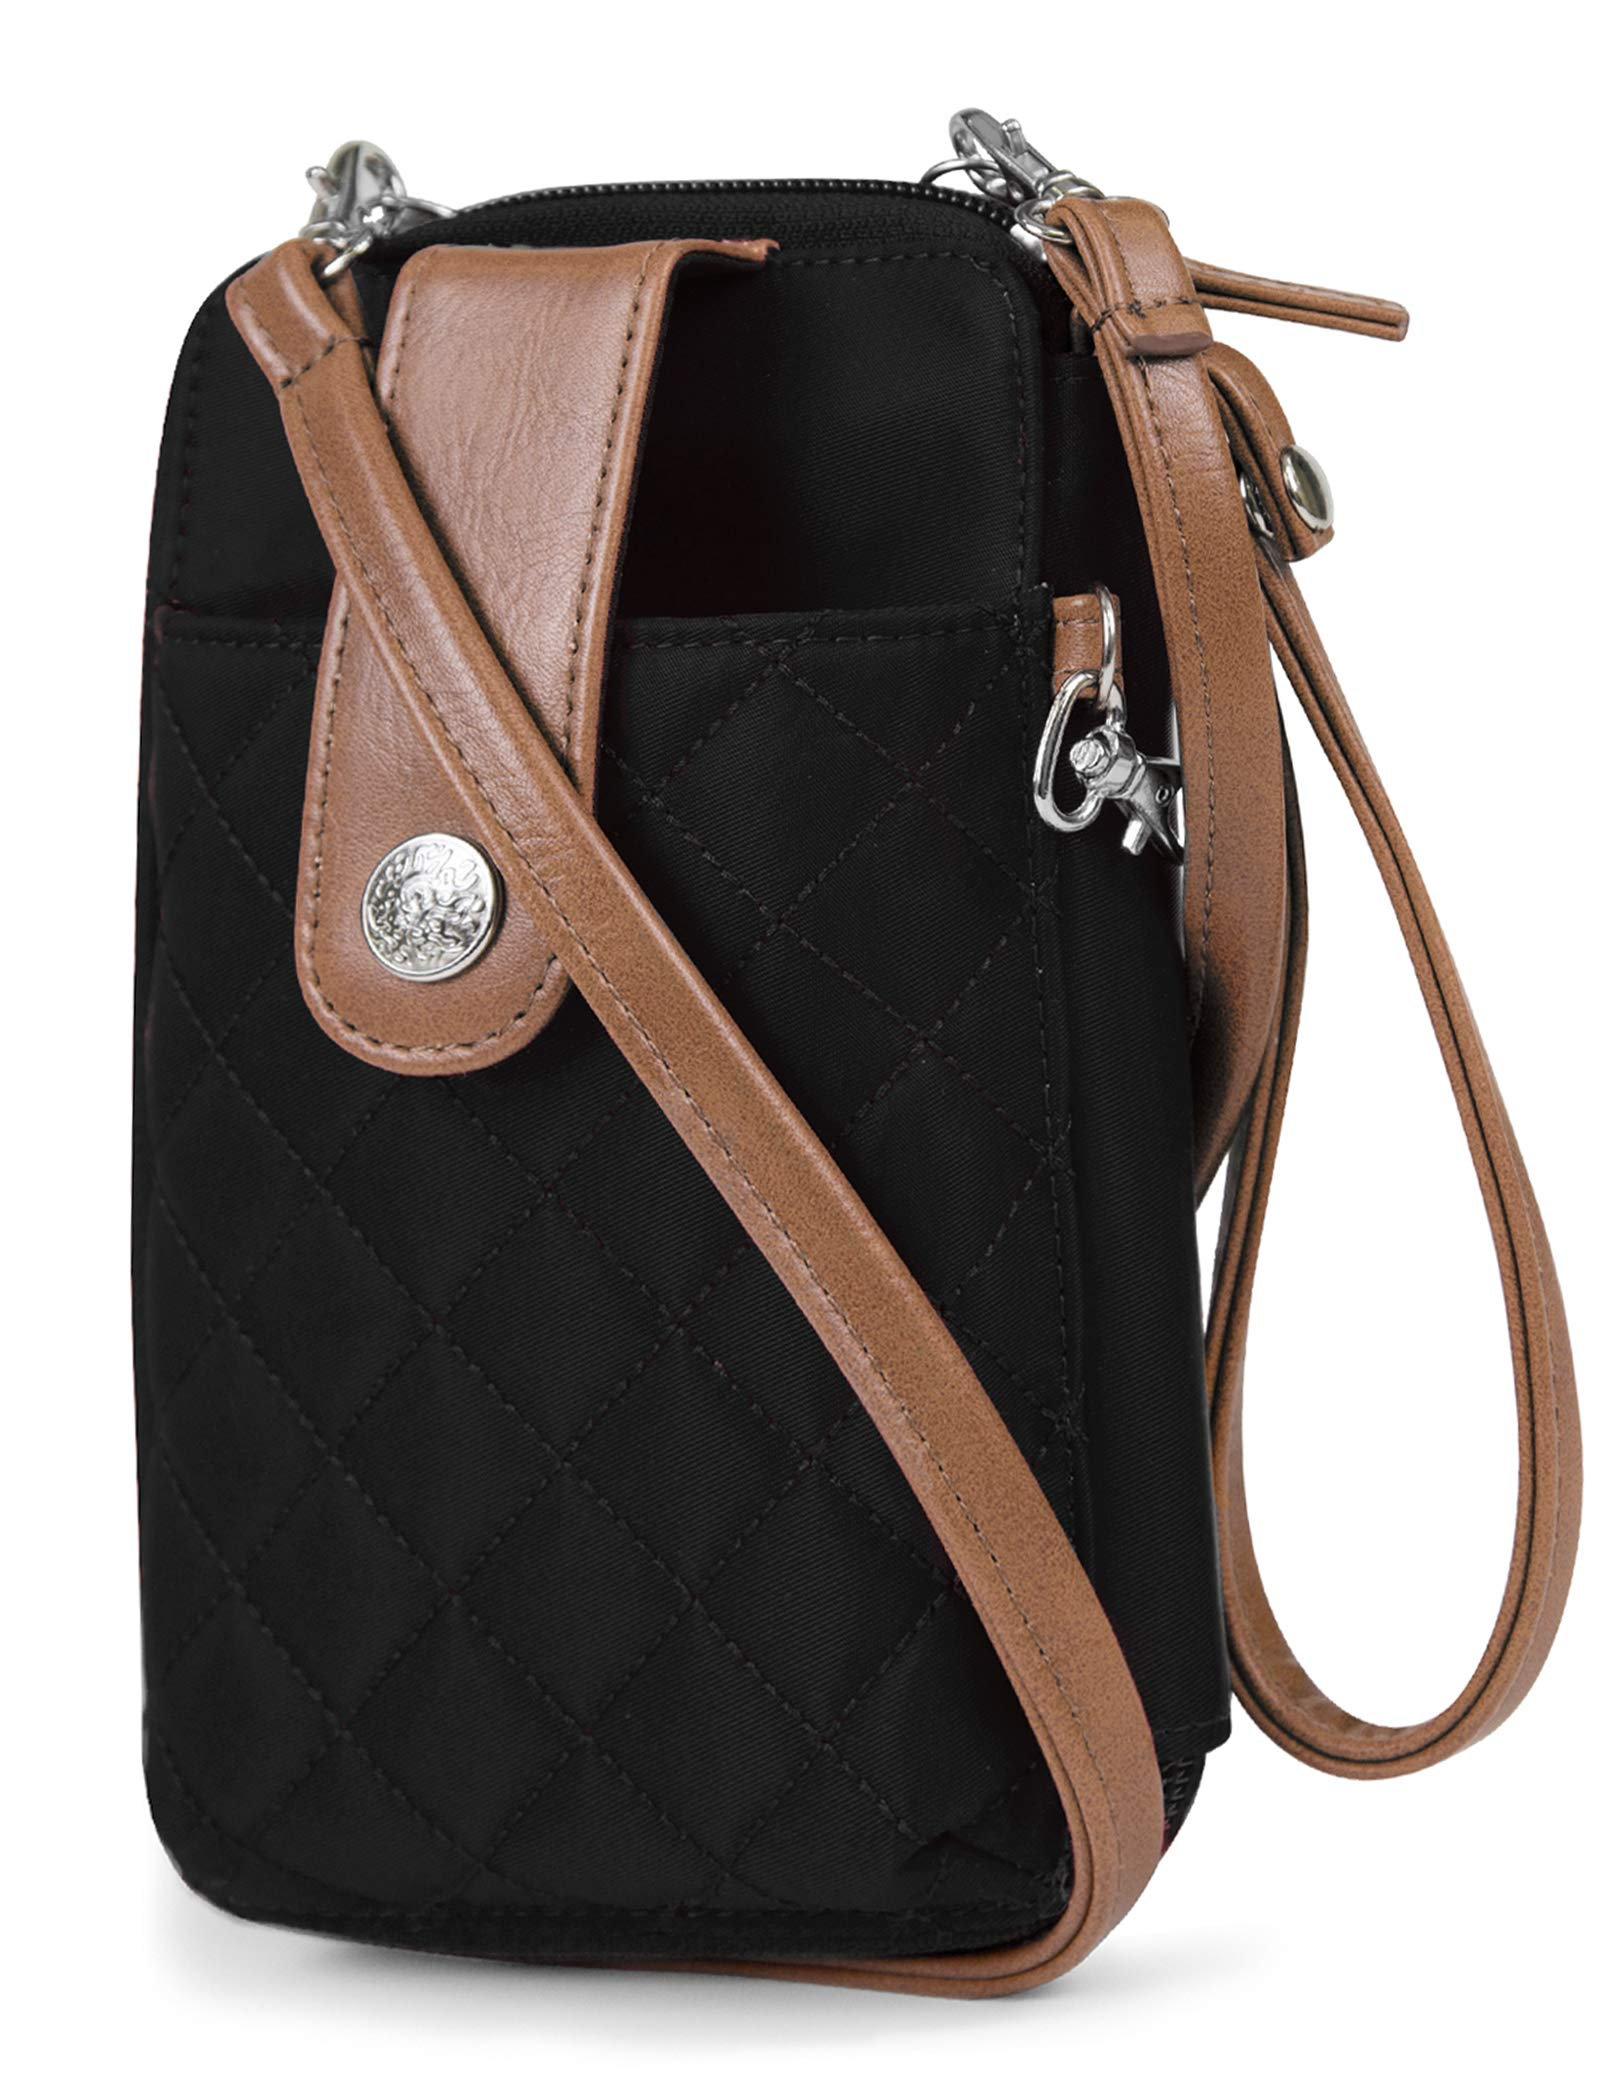 MUNDI Jacqui Vegan Leather RFID Womens Crossbody Cell Phone Purse Holder Wallet (Black Nylon) by Mundi